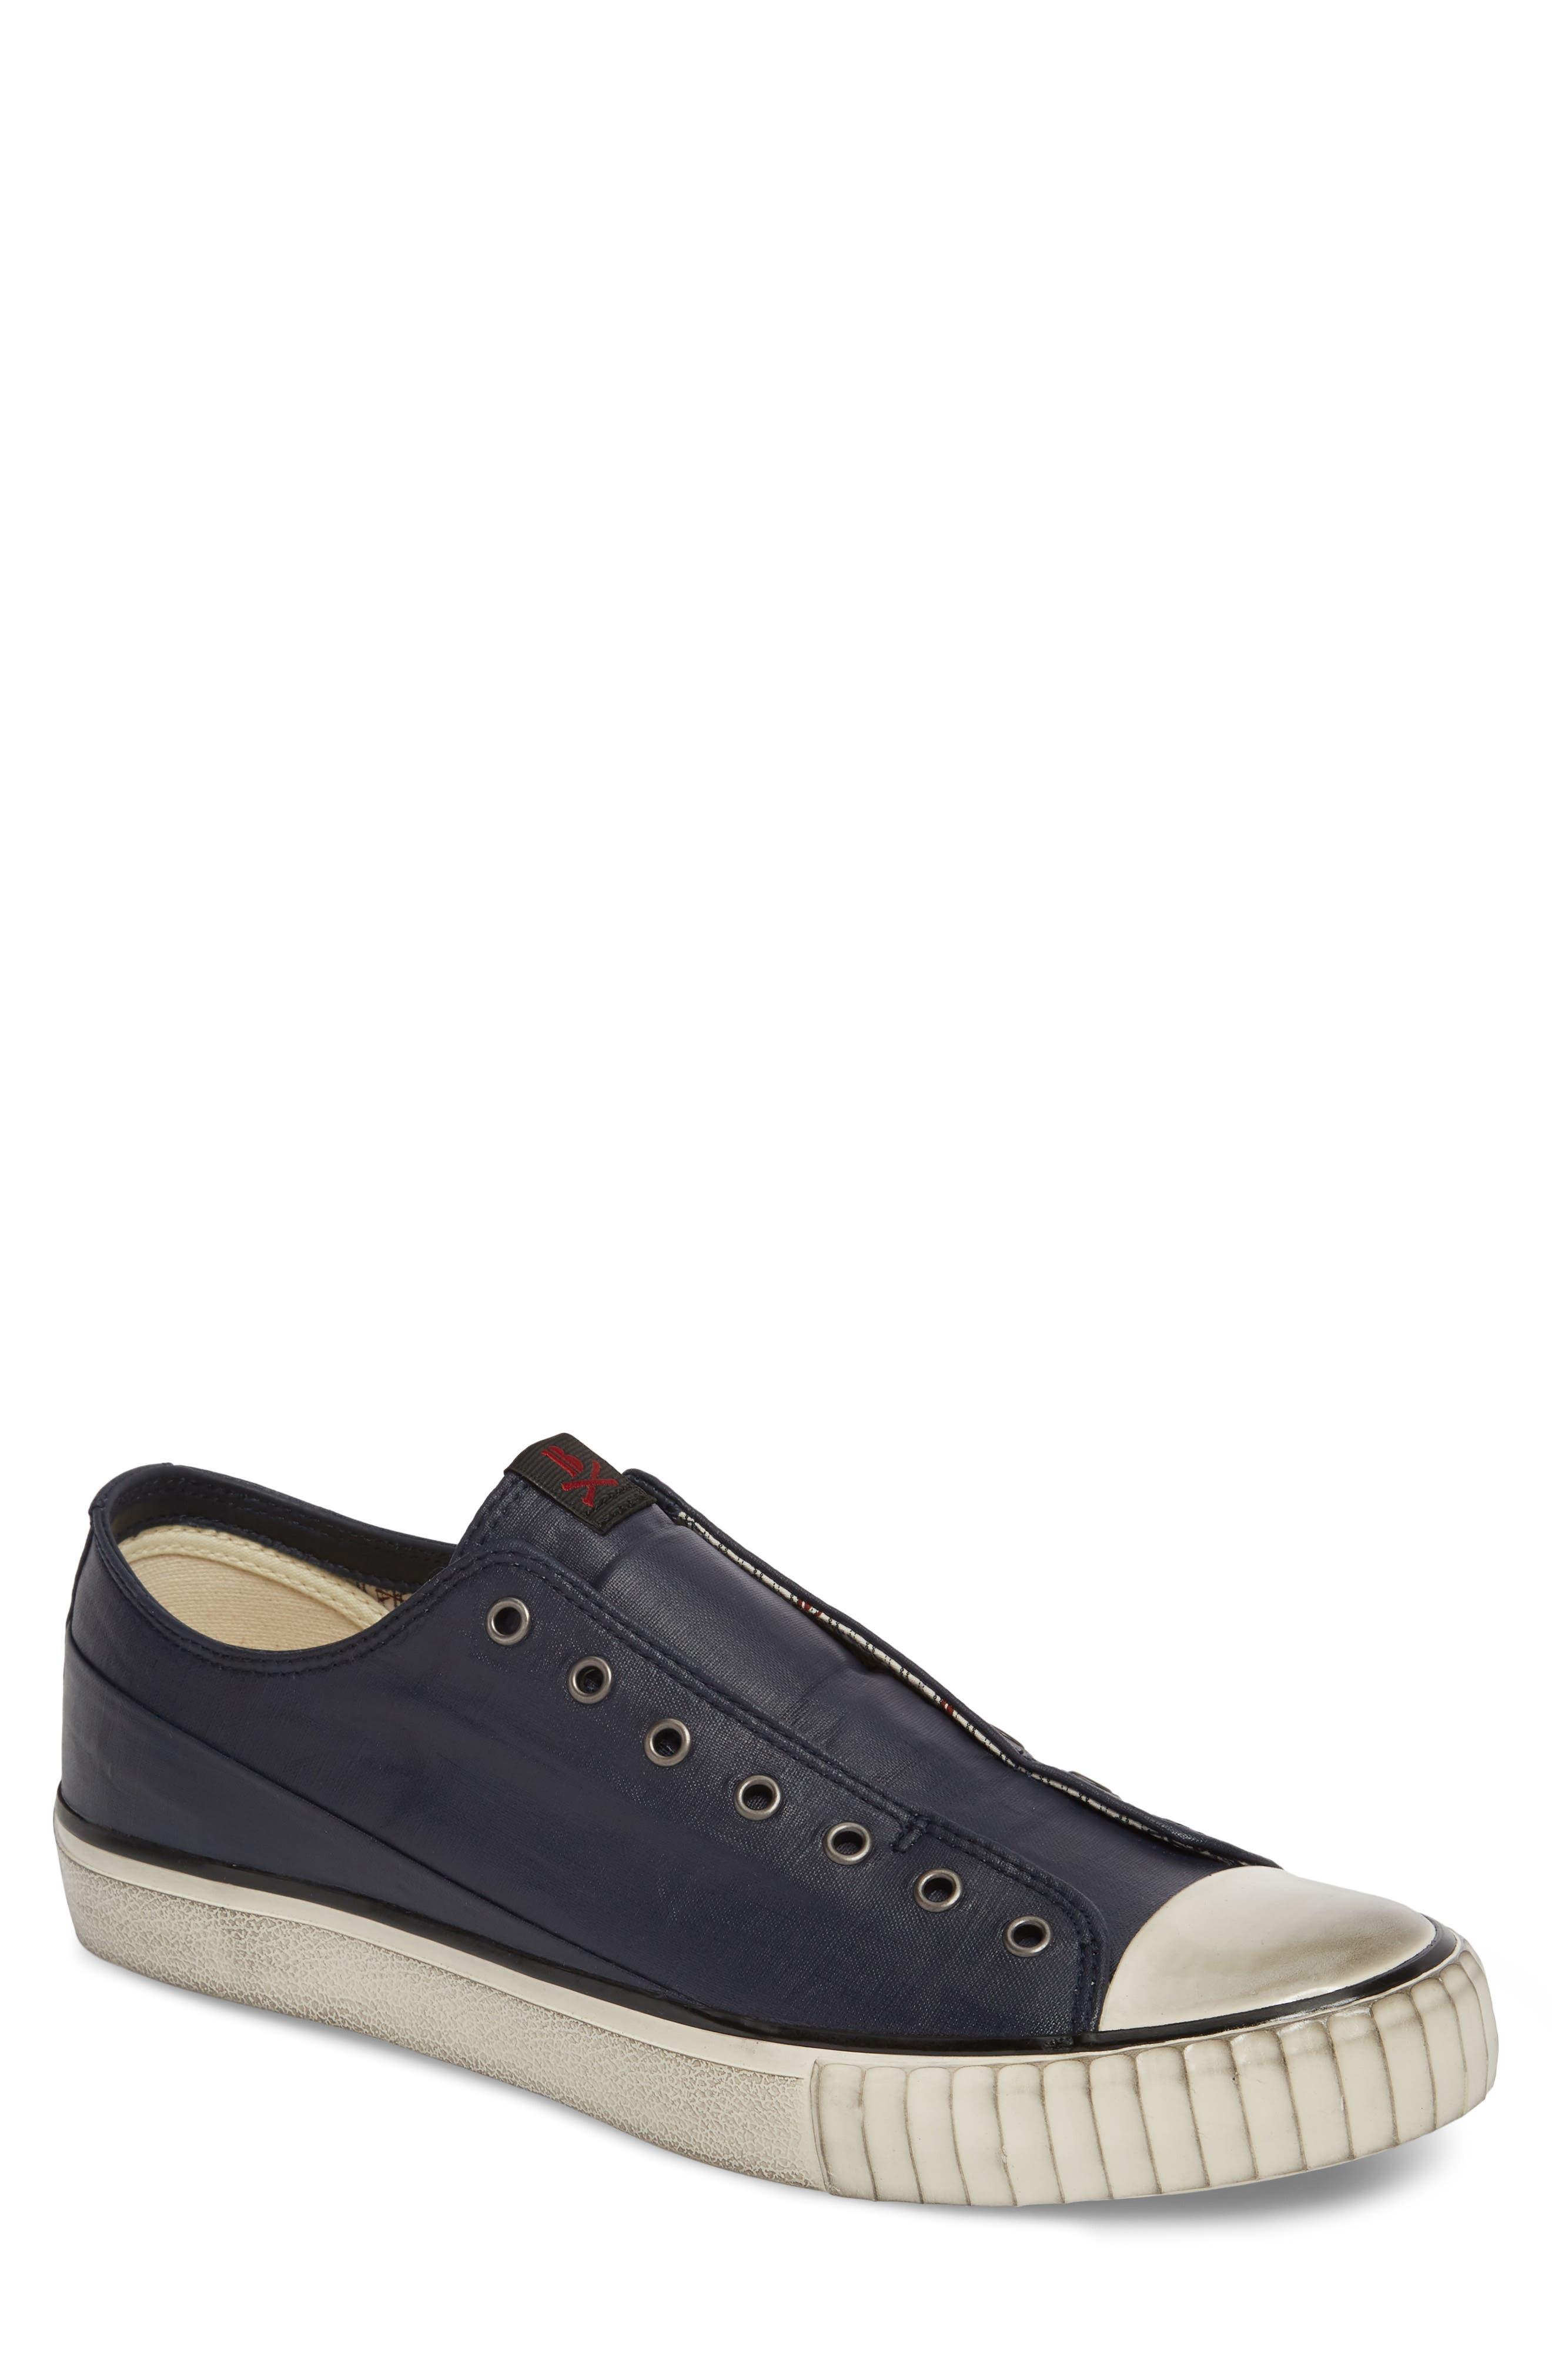 John Varvatos Star USA Bootleg Linen Laceless Sneaker,                             Main thumbnail 1, color,                             Midnight Linen